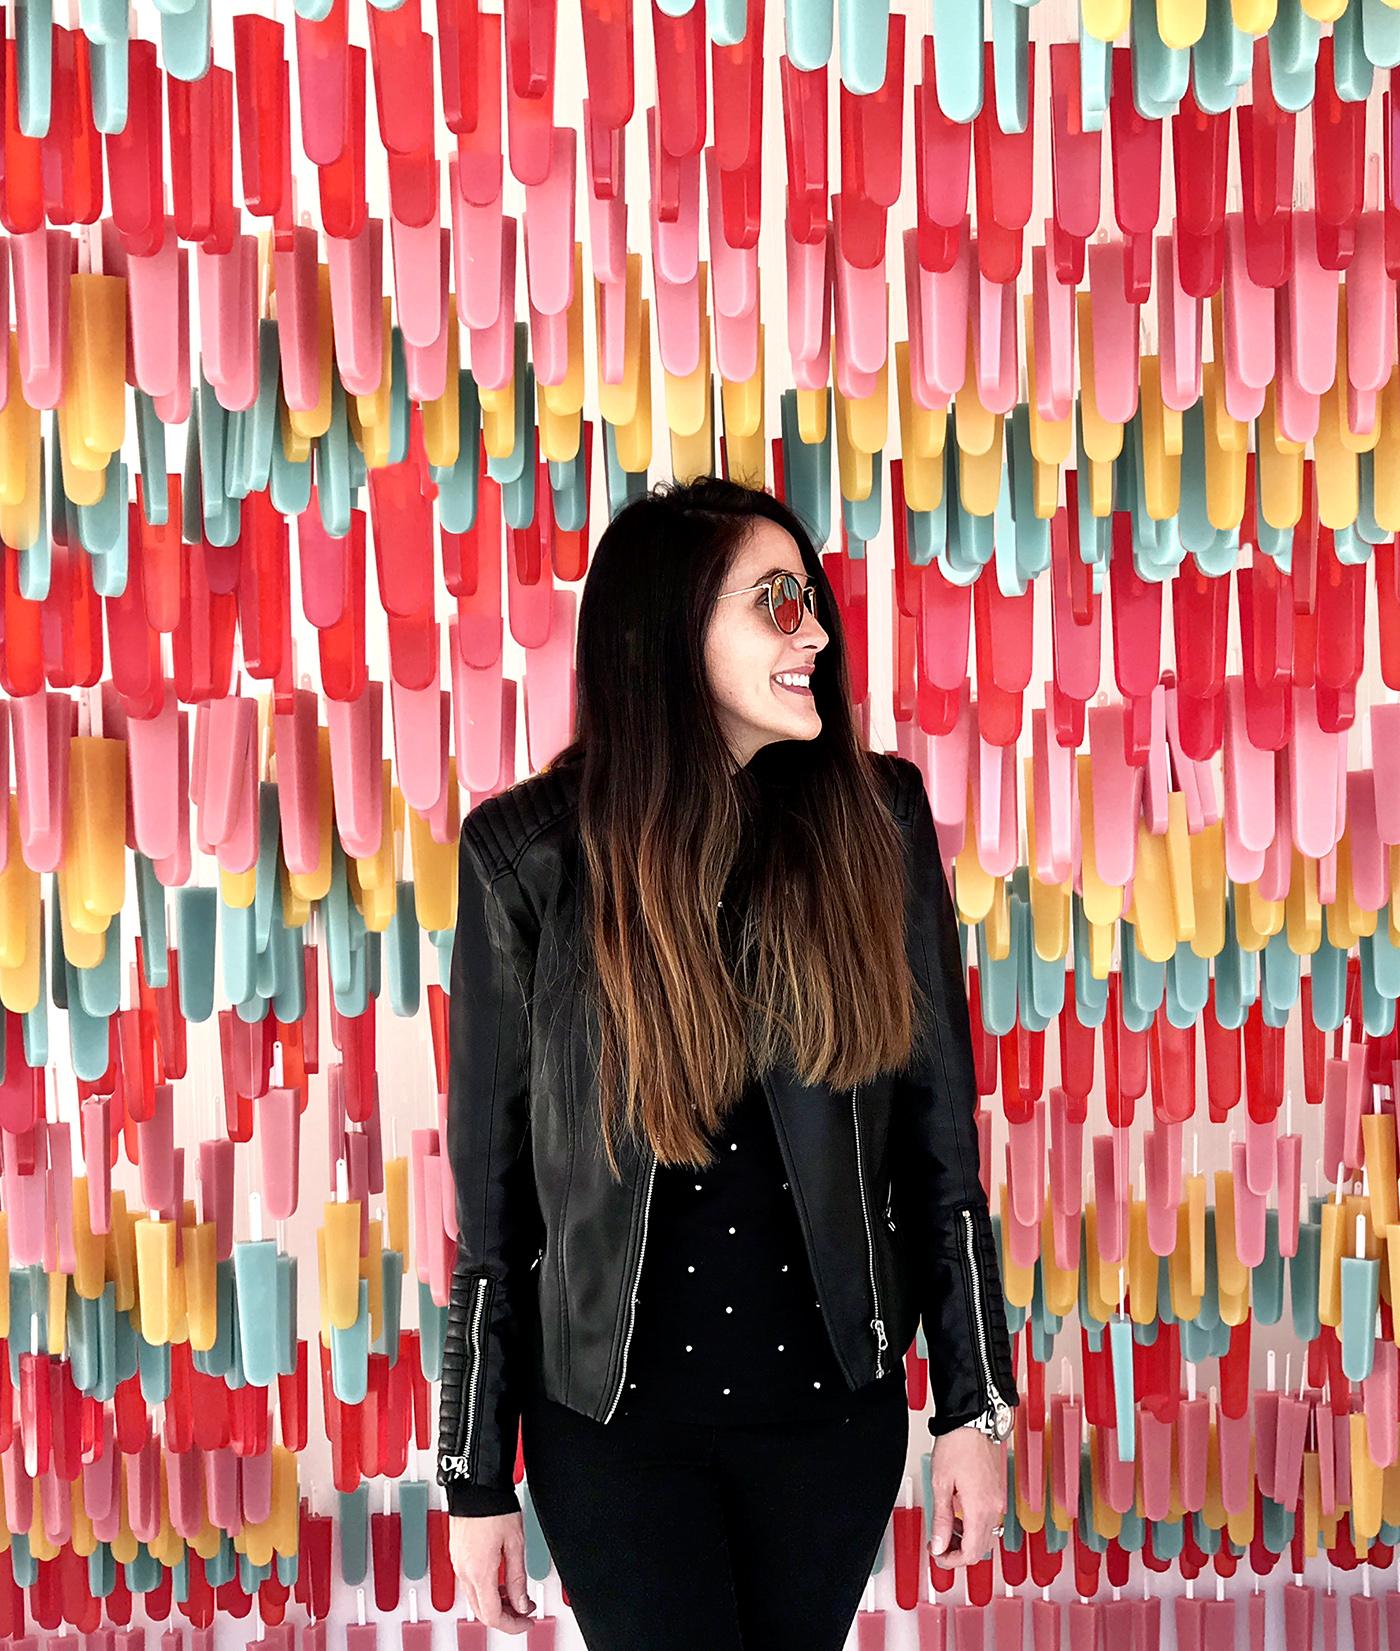 lollipops-cris.jpg